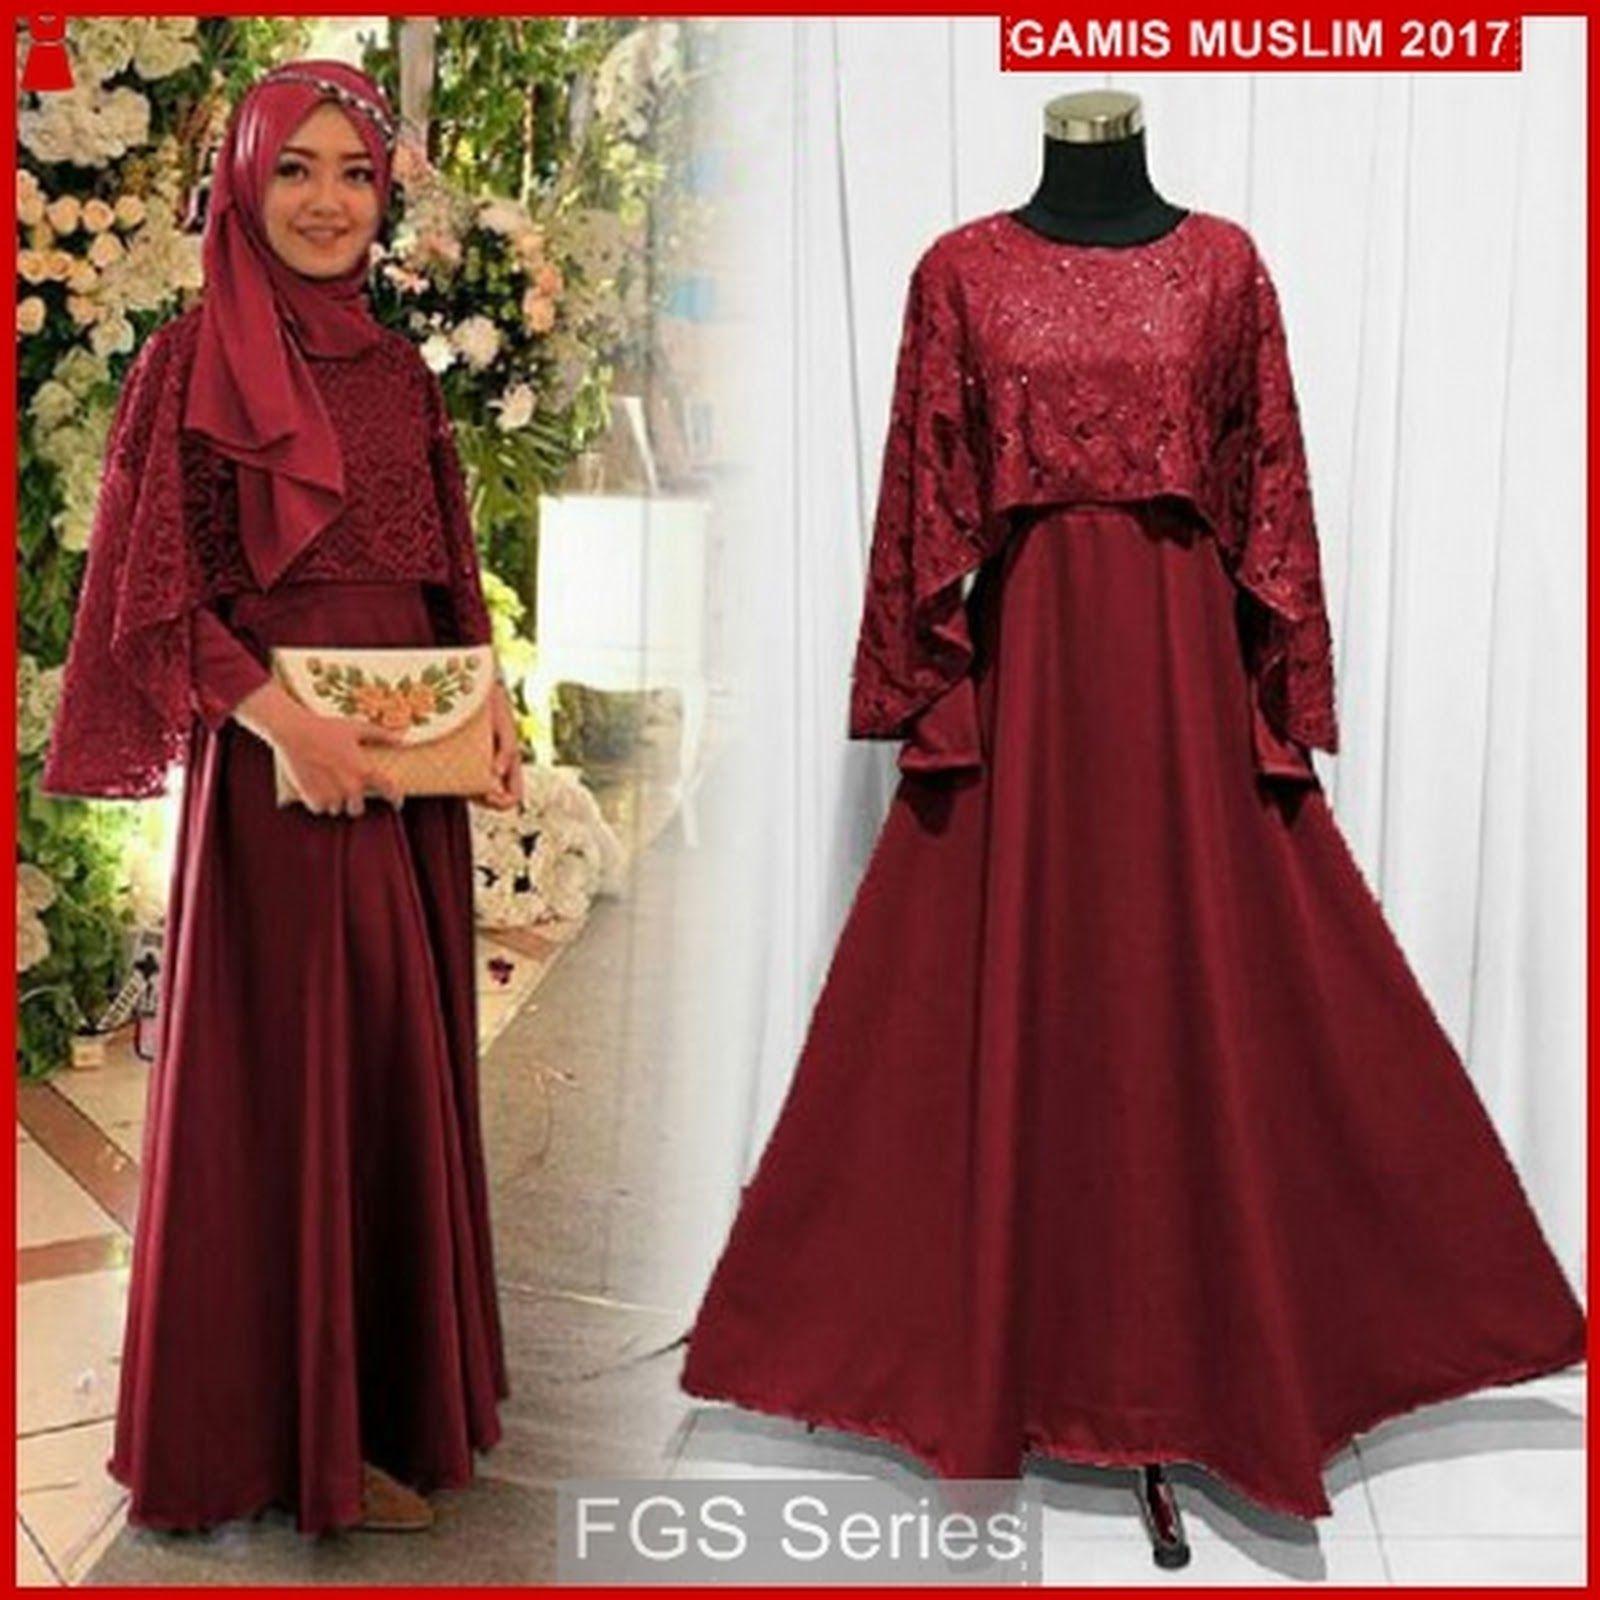 Gaun pesta merah maroon